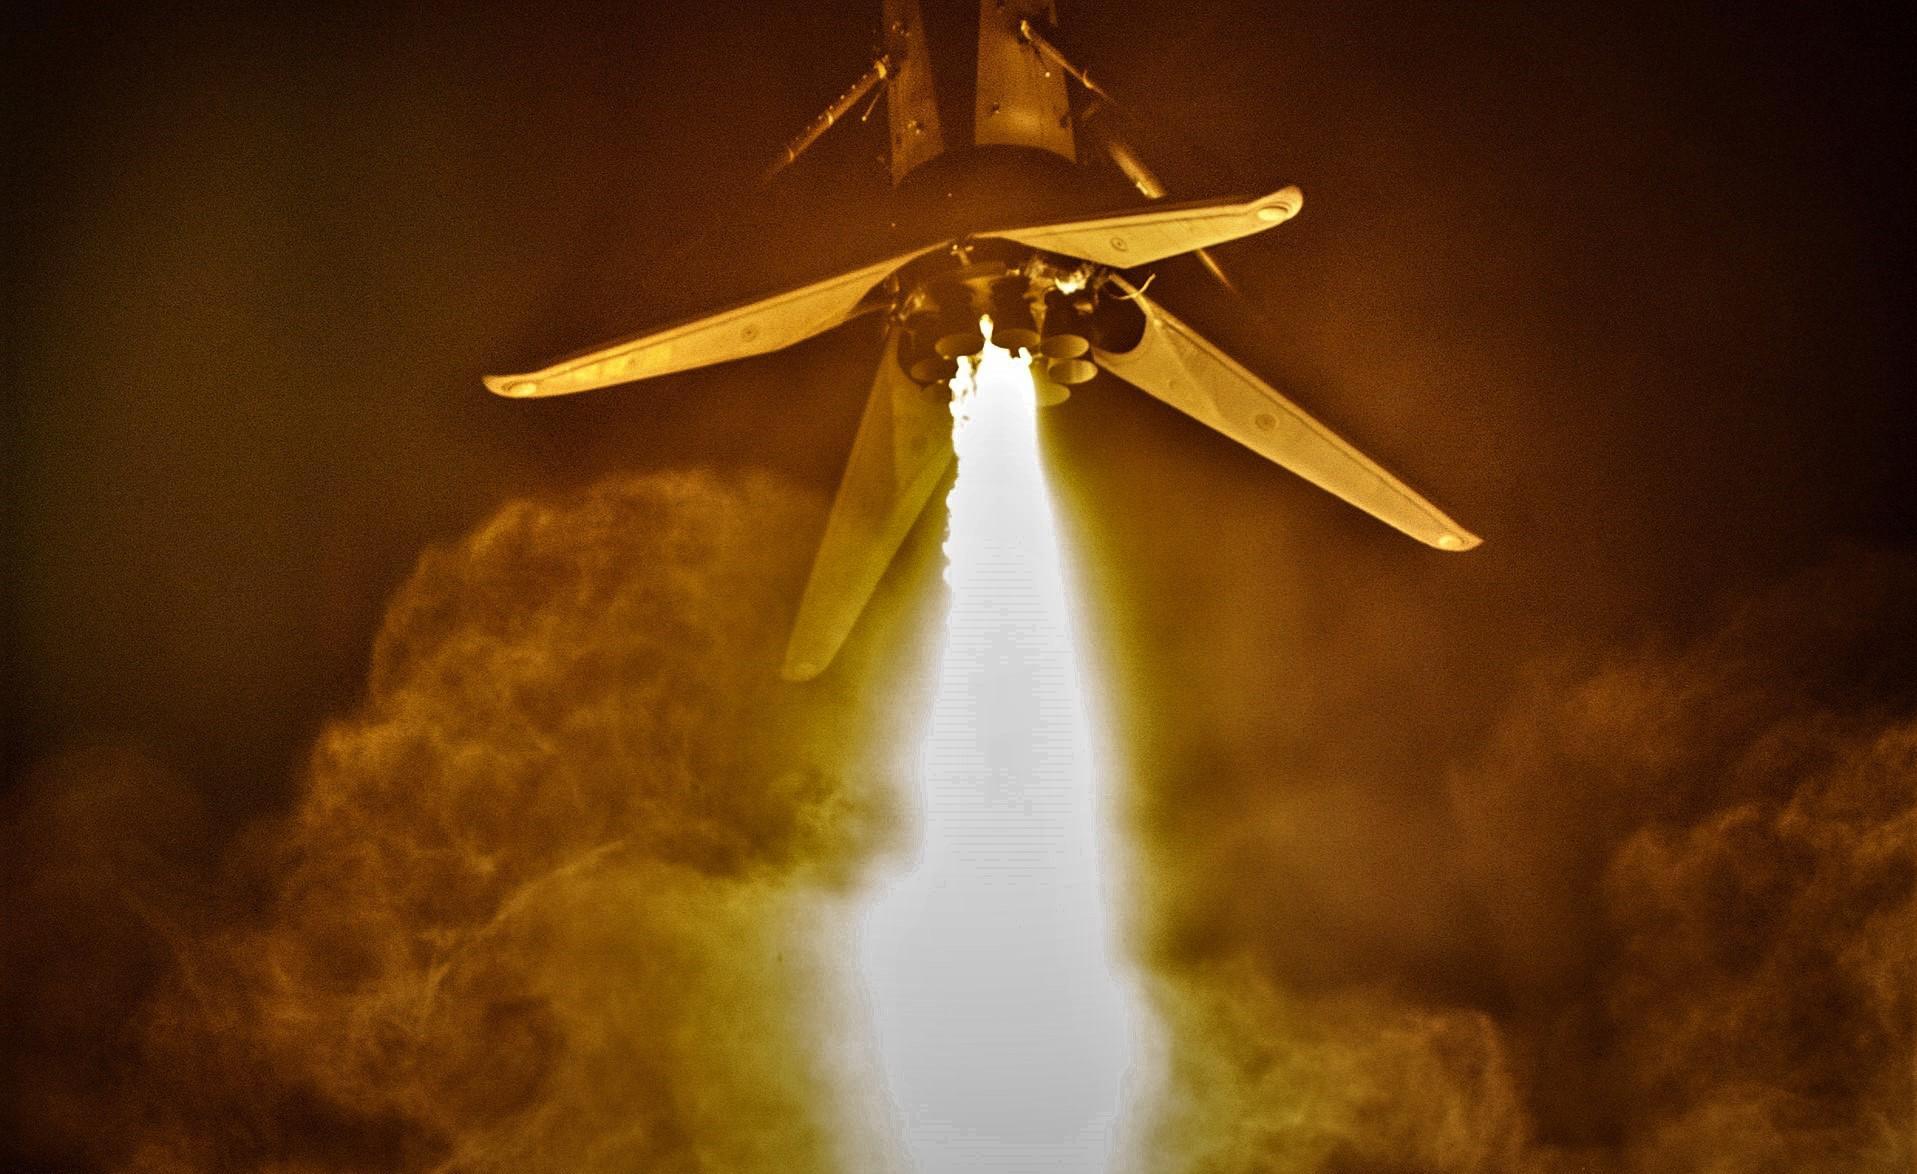 SAOCOM 1A B1048 landing (SpaceX) 1 edit 2